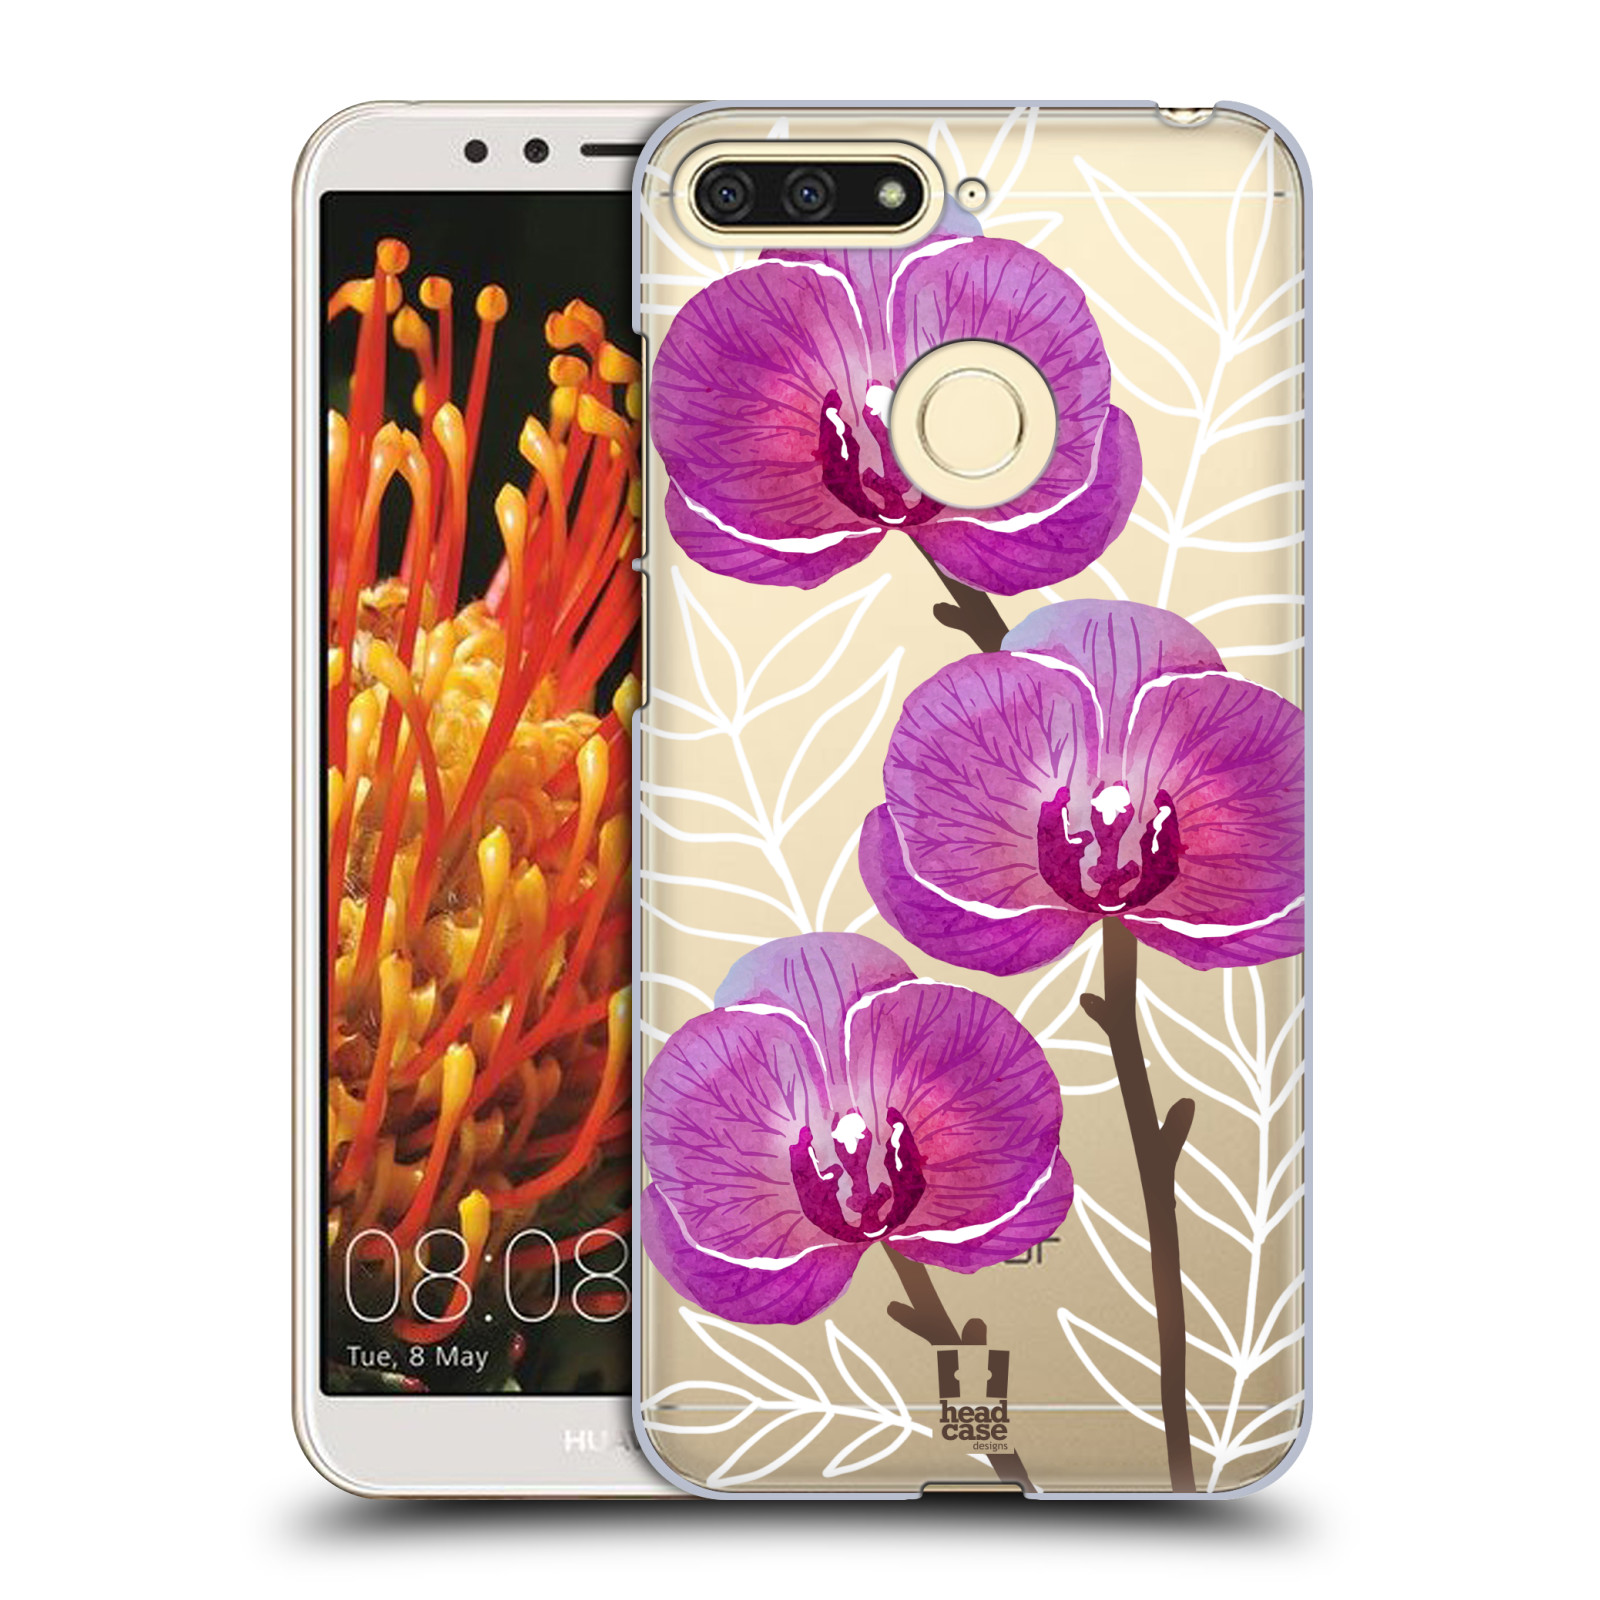 Plastové pouzdro na mobil Huawei Y6 Prime 2018 - Head Case - Hezoučké kvítky - průhledné